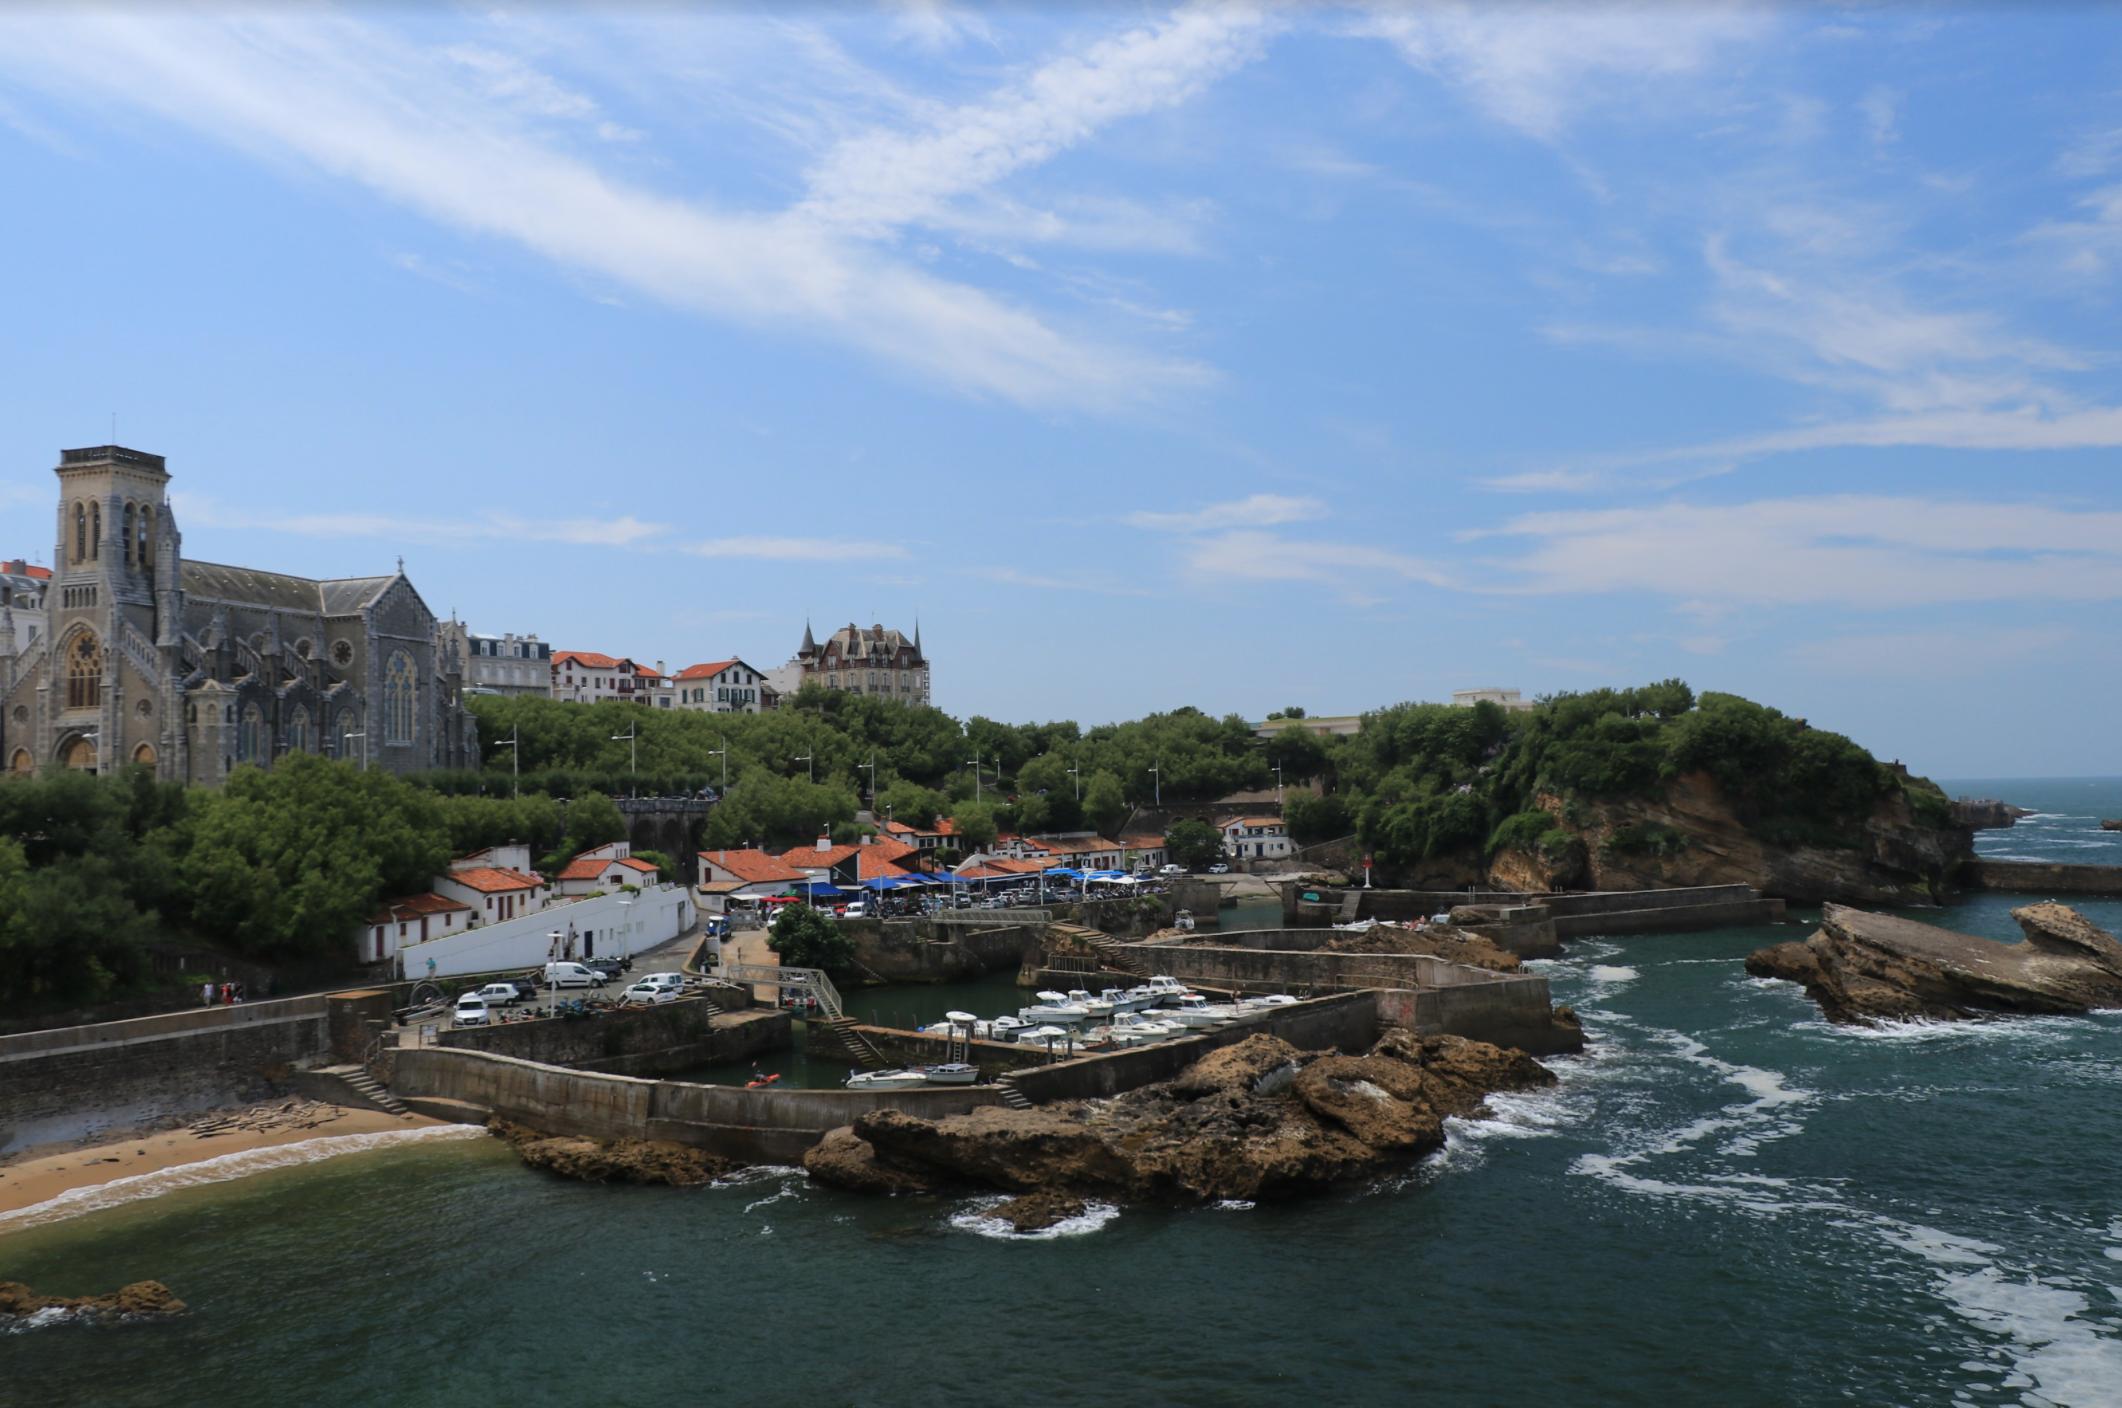 Biarritz France bridges and ocean